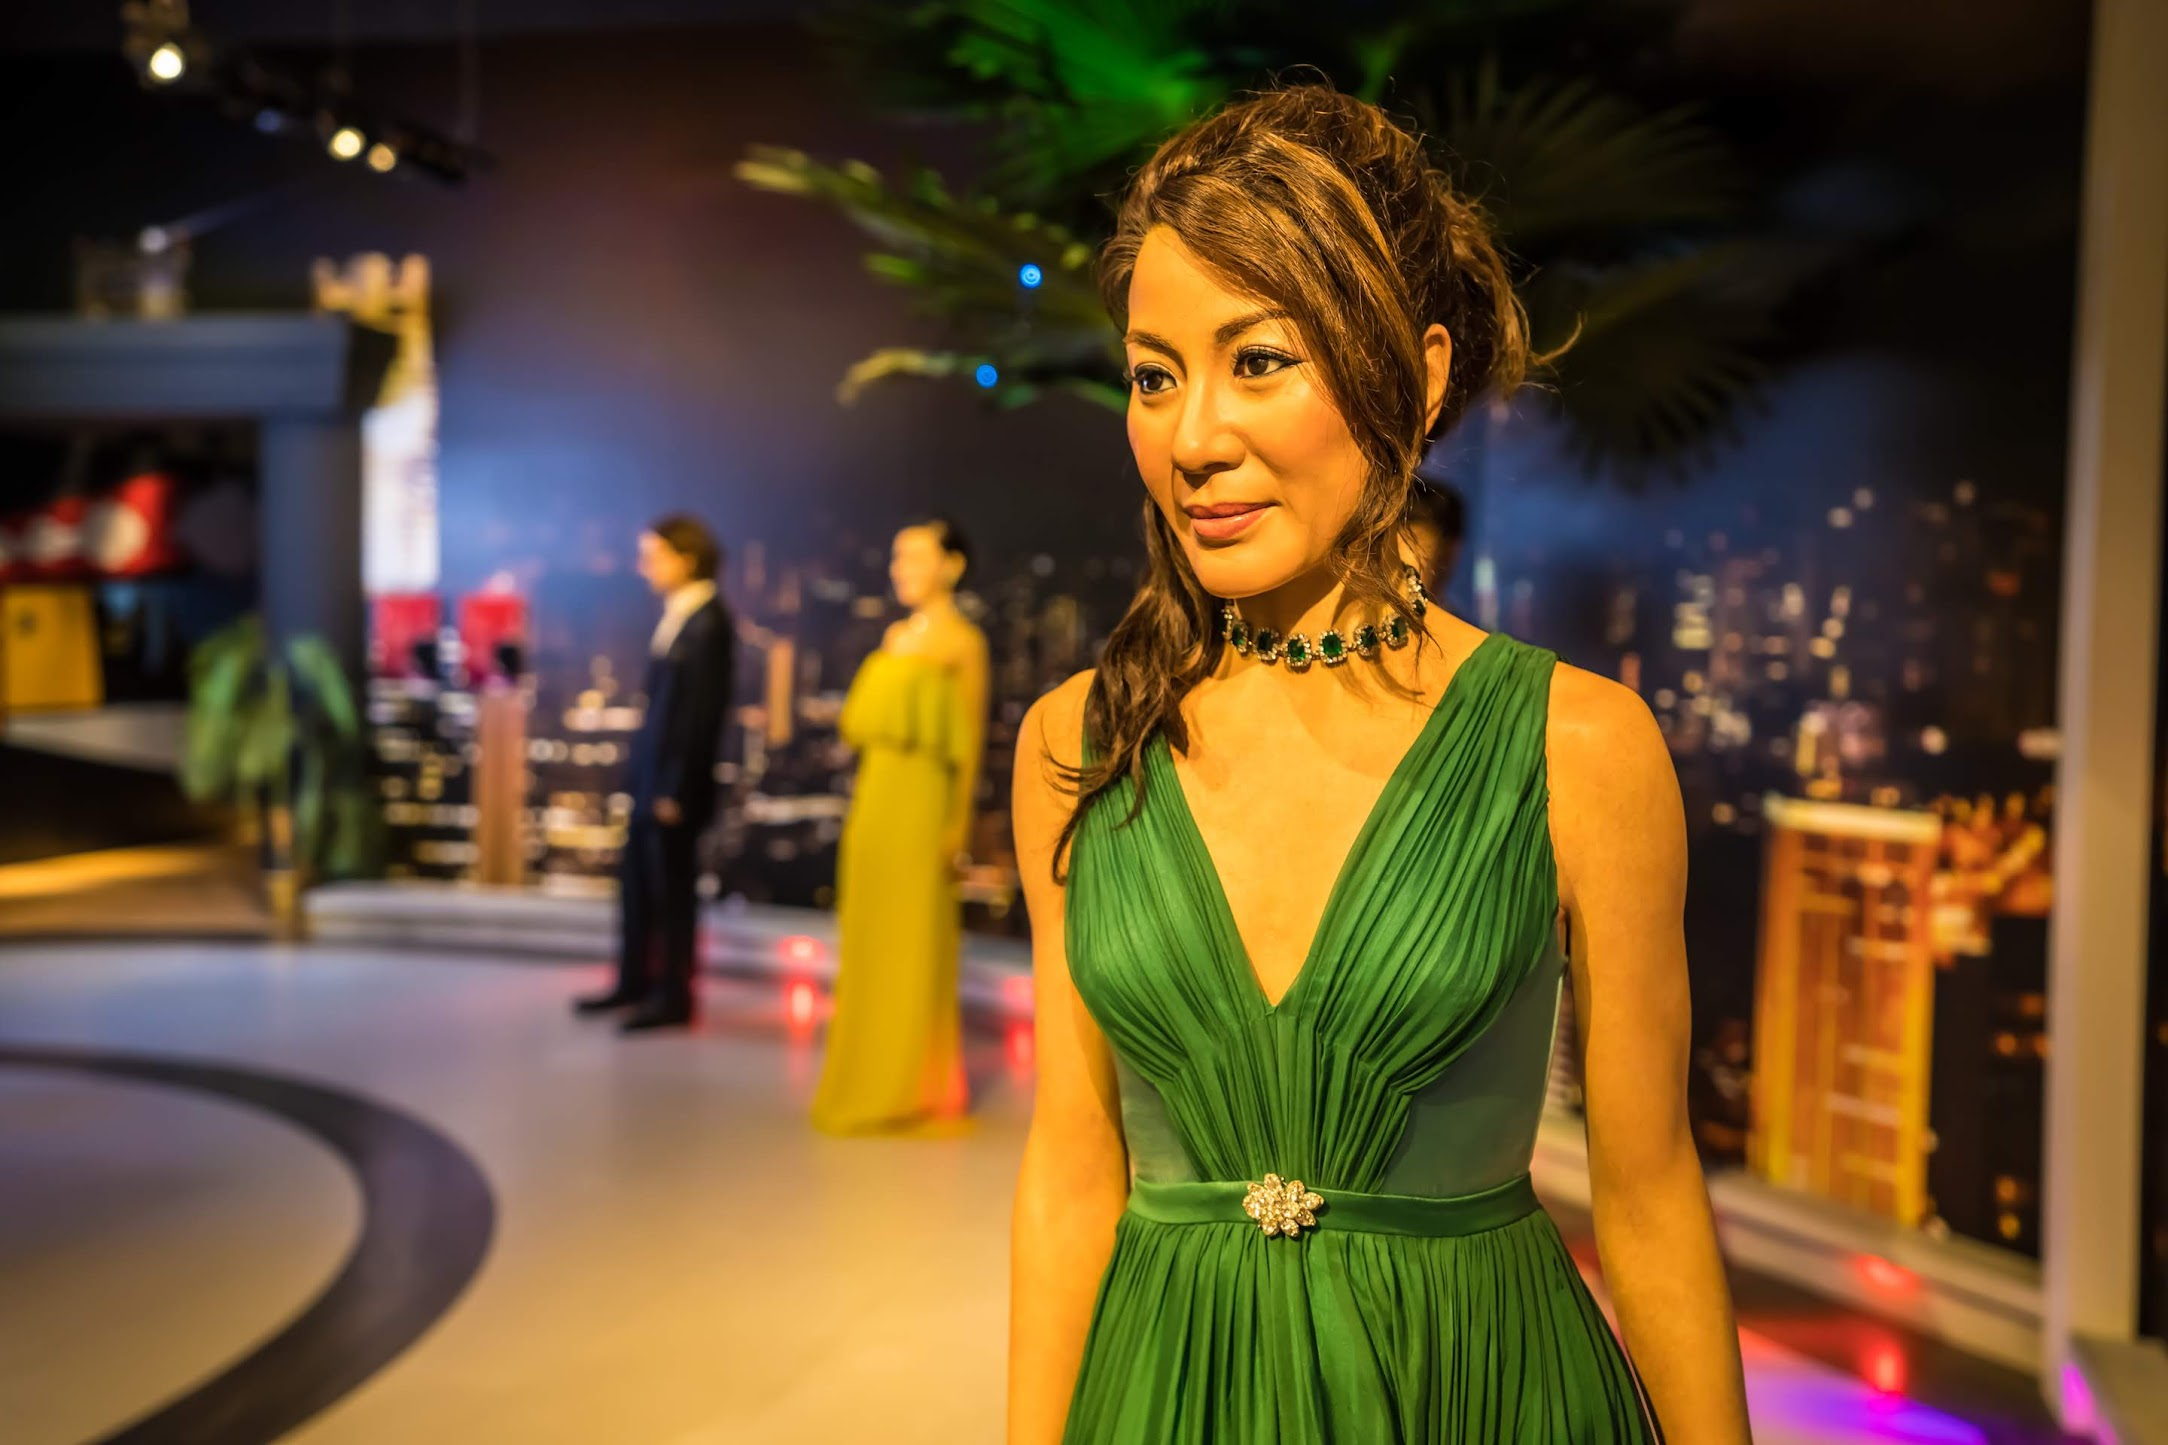 Singapore Sentosa Island Madame Tussauds Singapore Michelle Yeoh